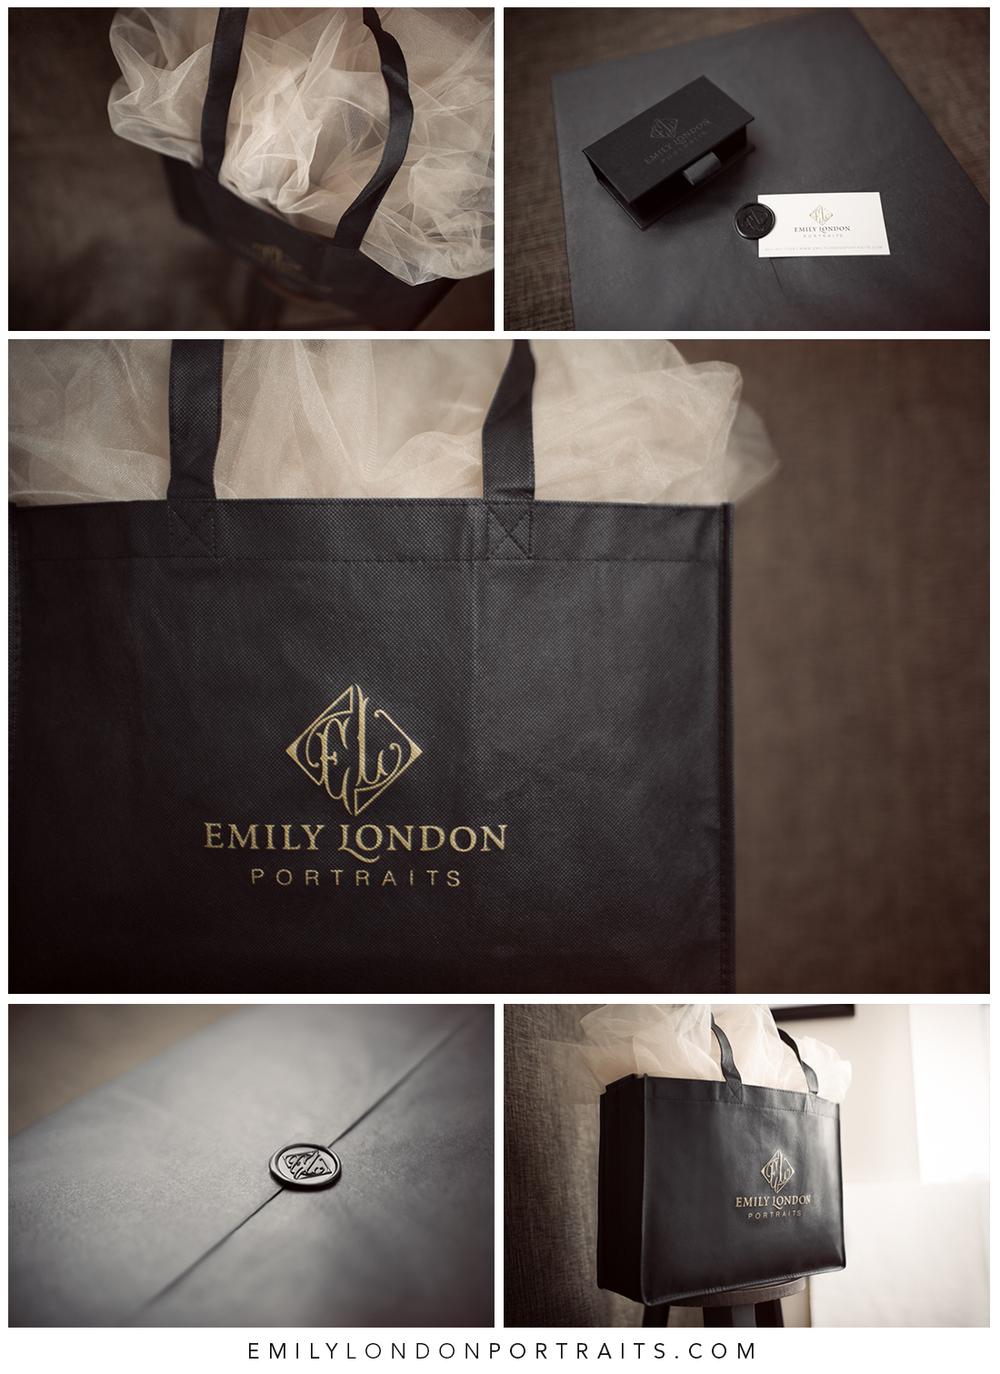 The beautiful packaging fromEmily London Portraits in Utah.